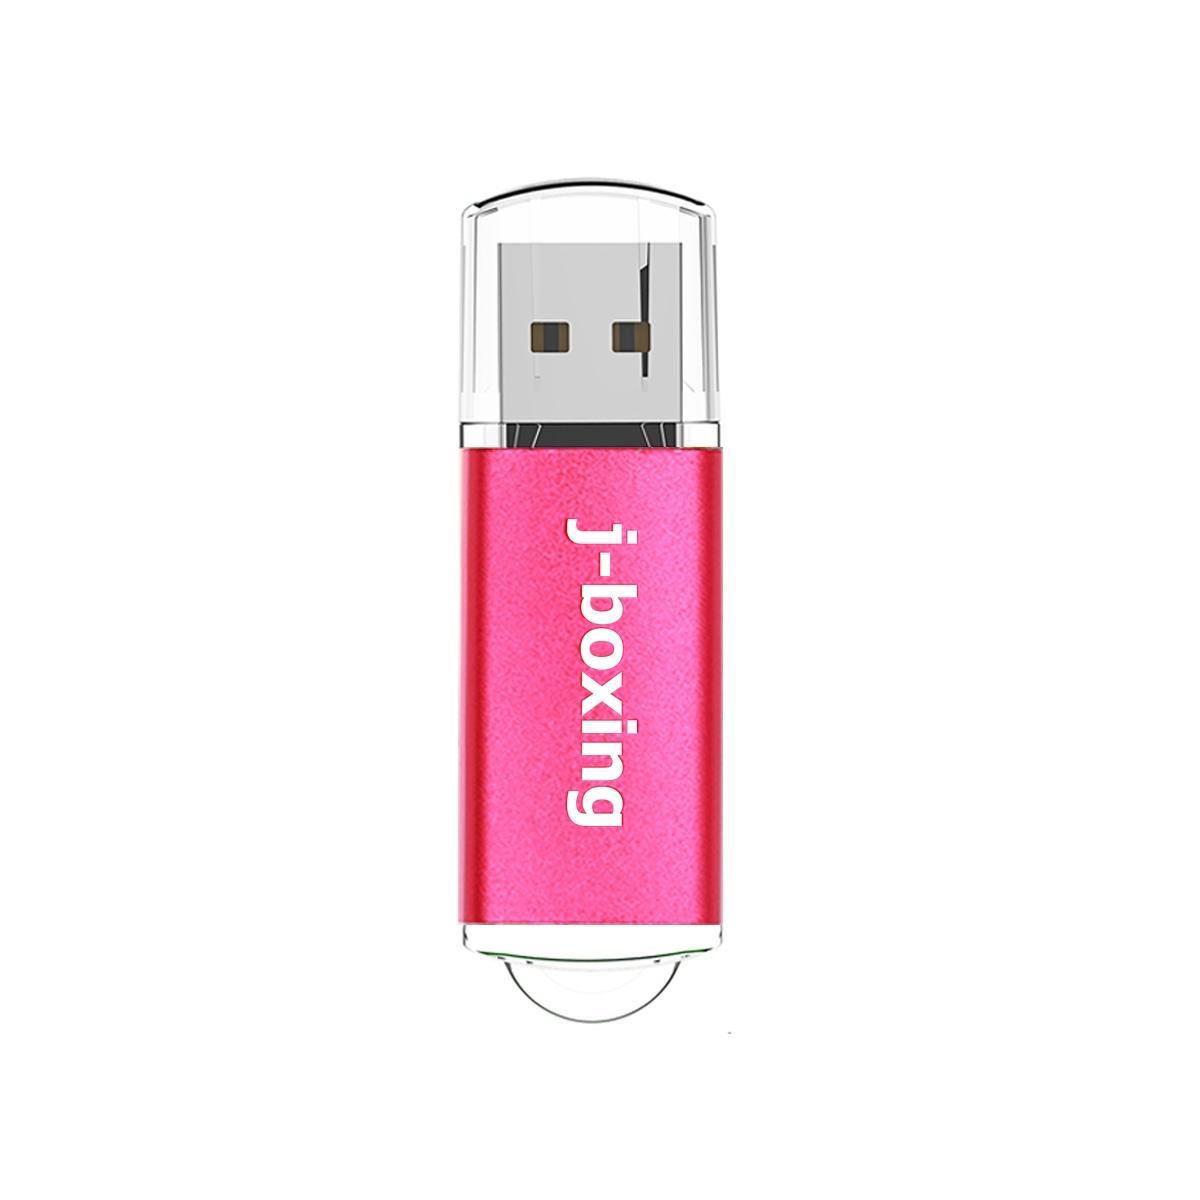 J-boxing Pink Rectangle 32GB USB Flash Drive Enough Memory Sticks usb 2.0 Flash Pen Drive for Computer Laptop Macbook Tablet Thumb Storage